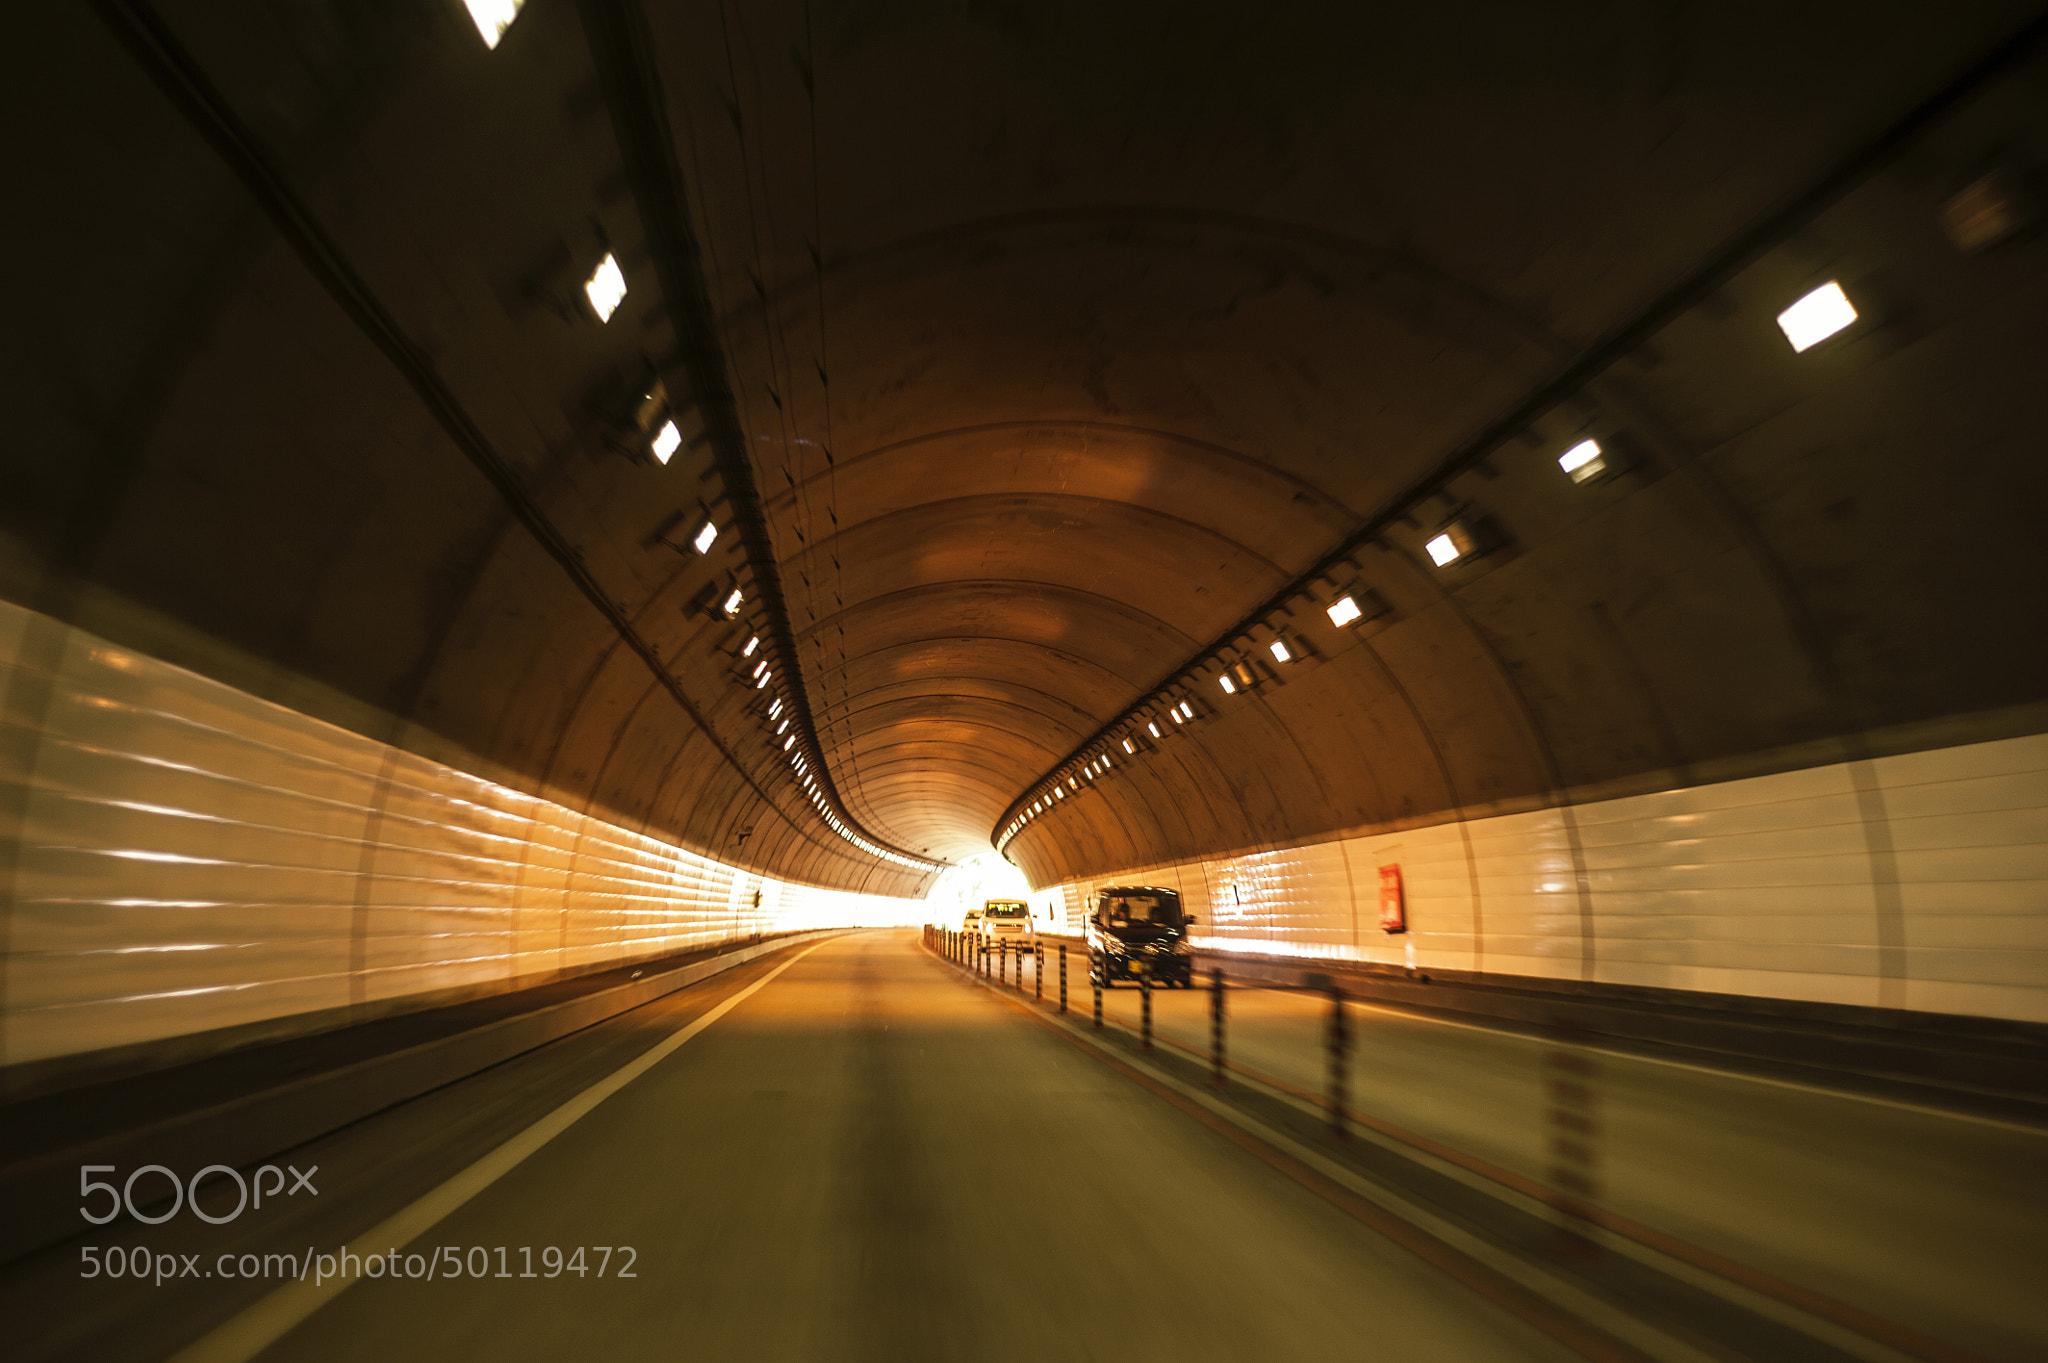 Photograph The Tunnel by hugh dornan on 500px